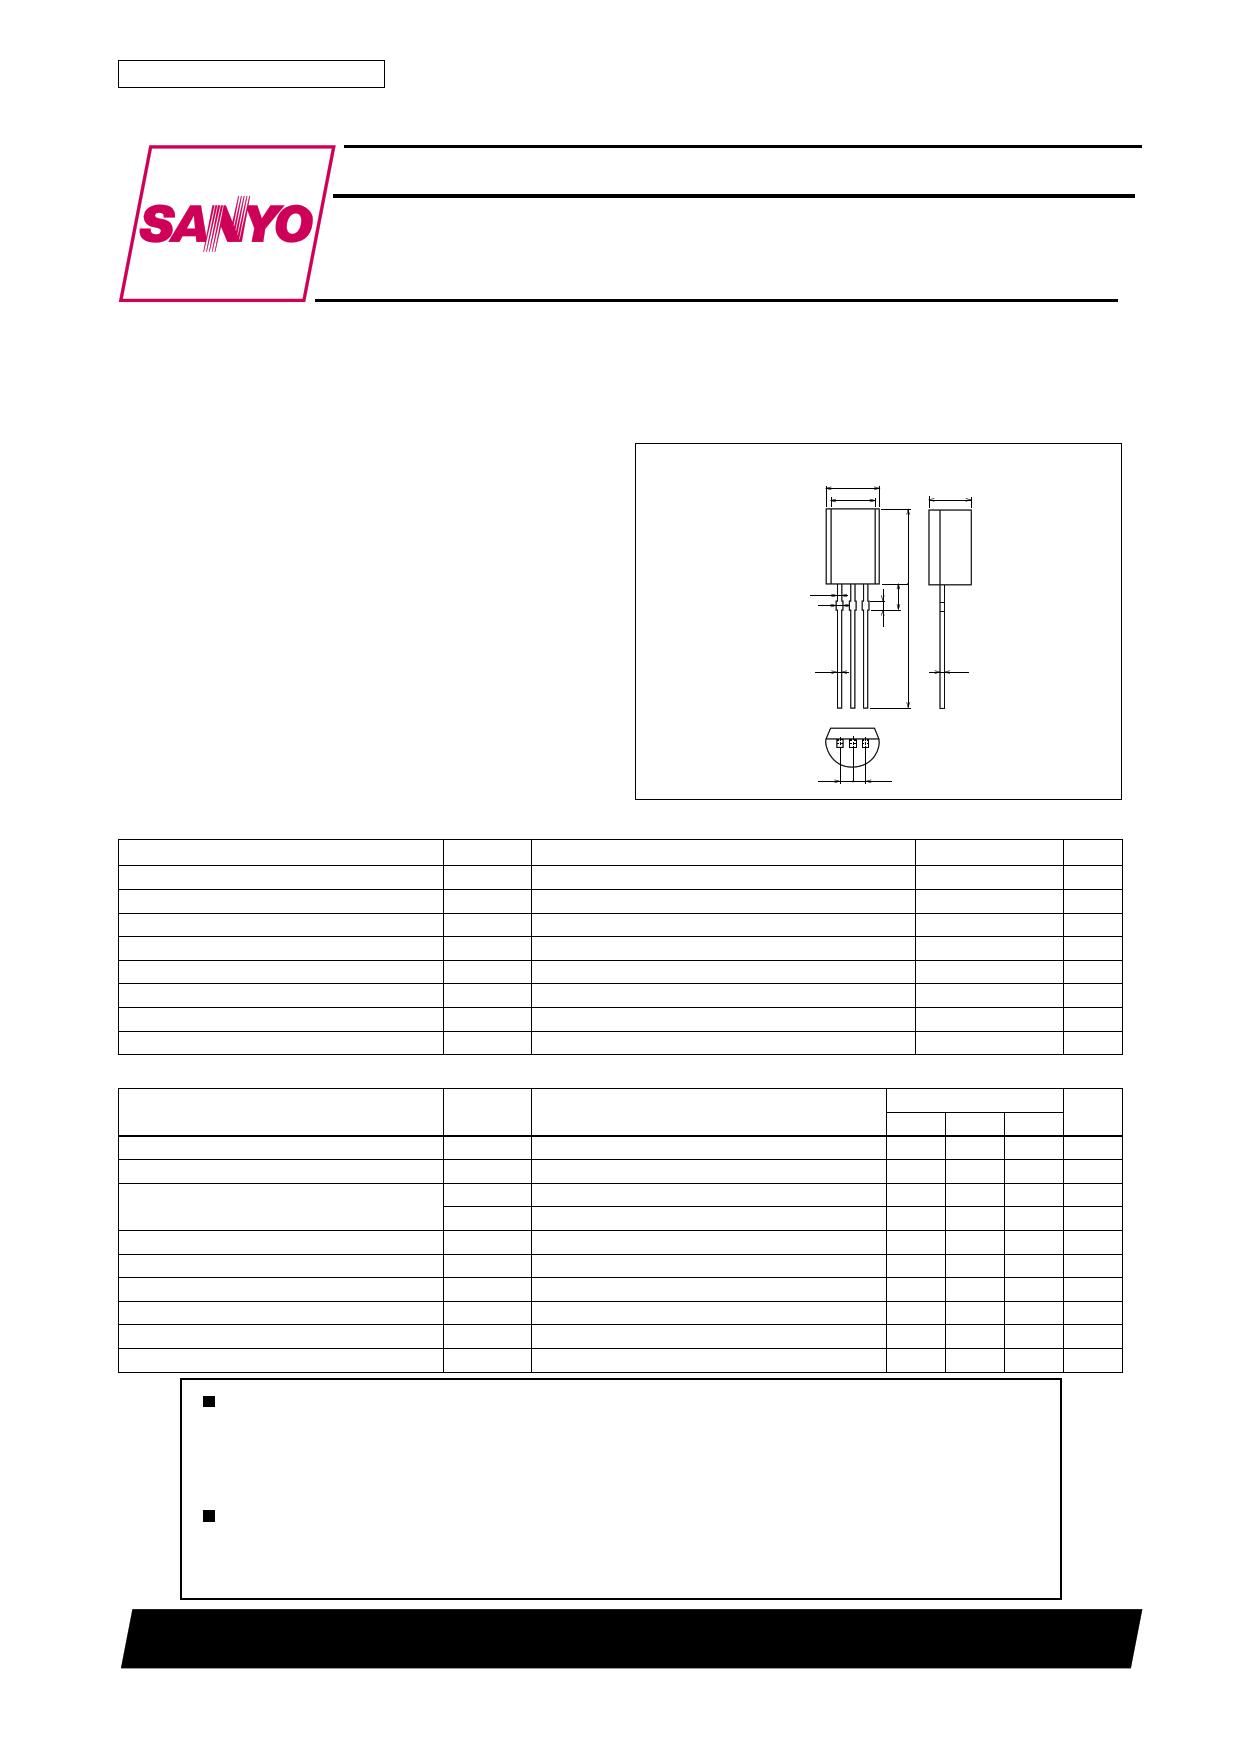 B865 datasheet